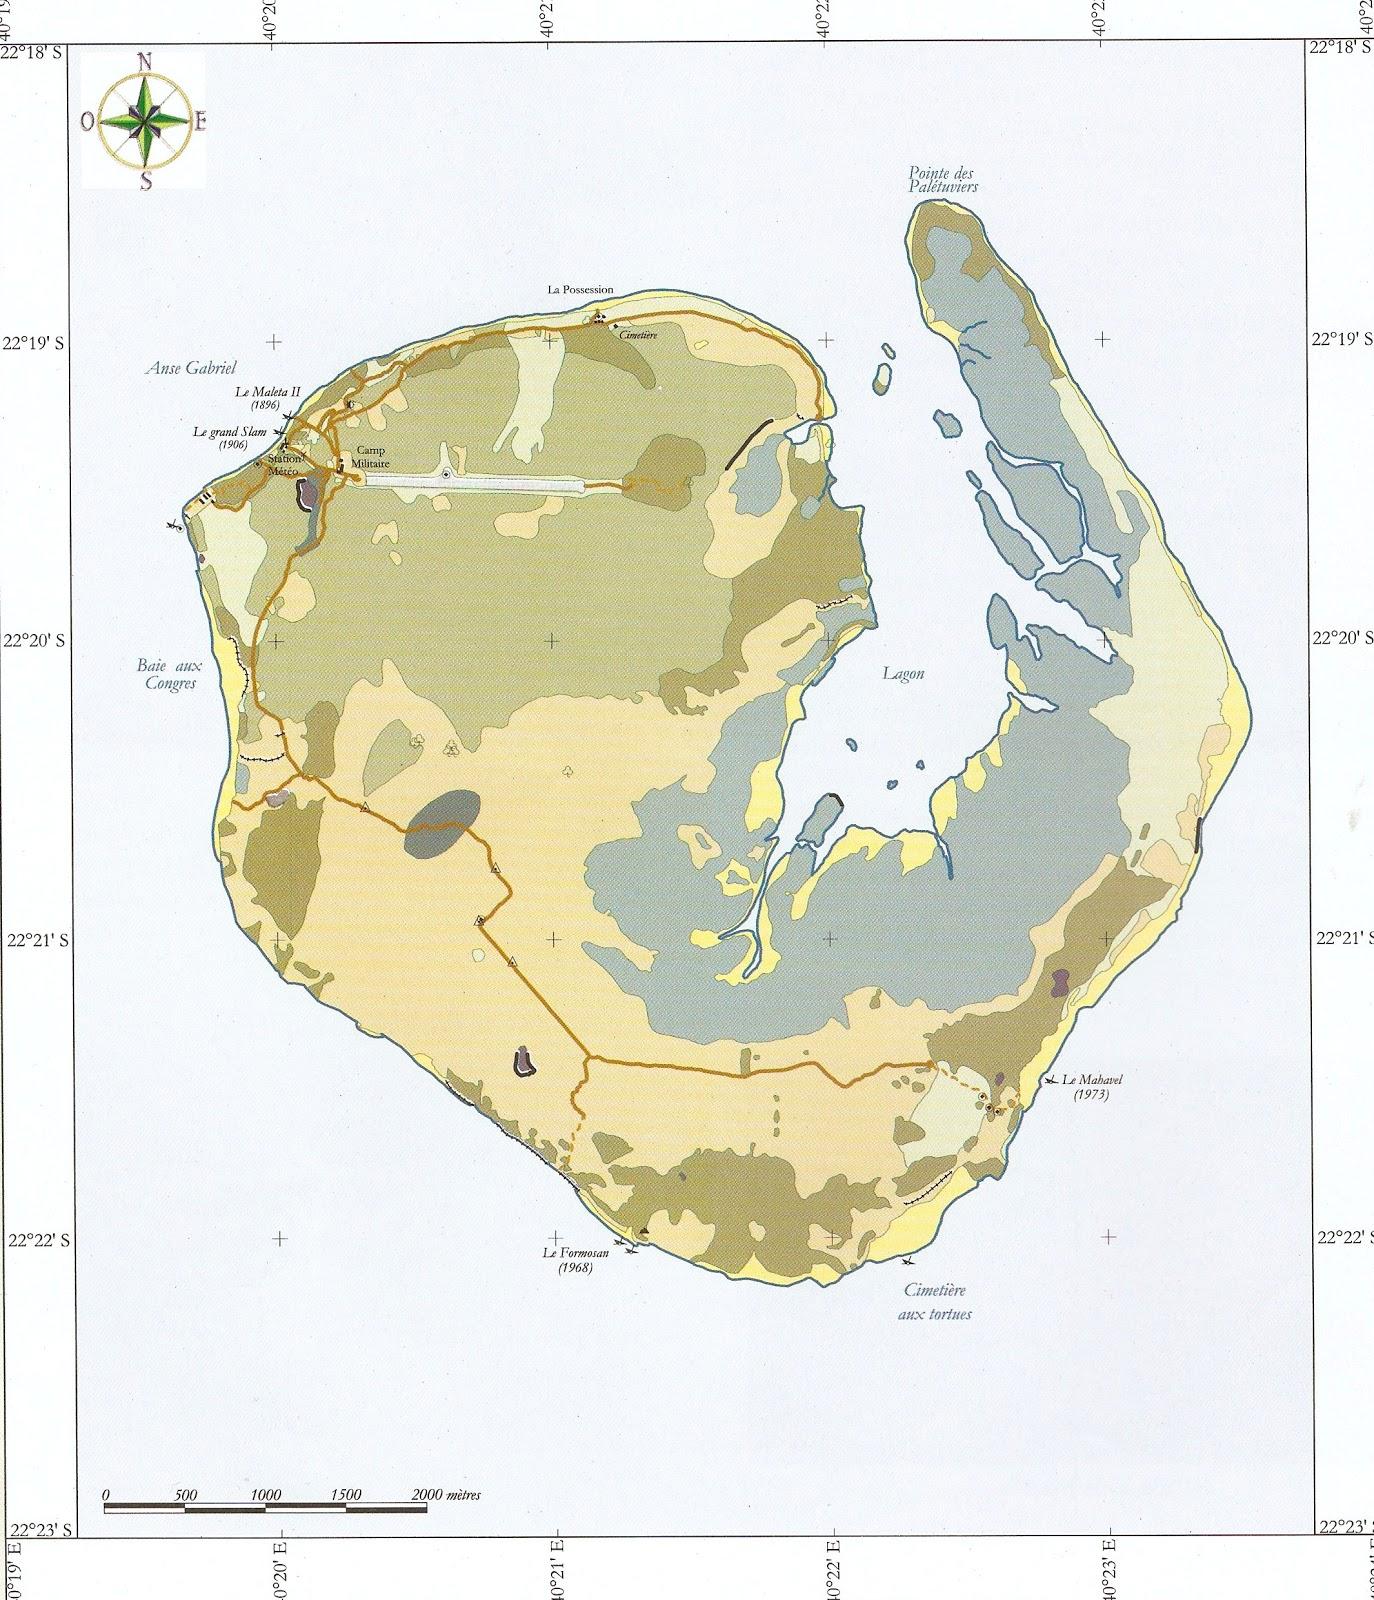 La marcophilie navale europa joyau naturel des eparses for Desherbant naturel grande surface